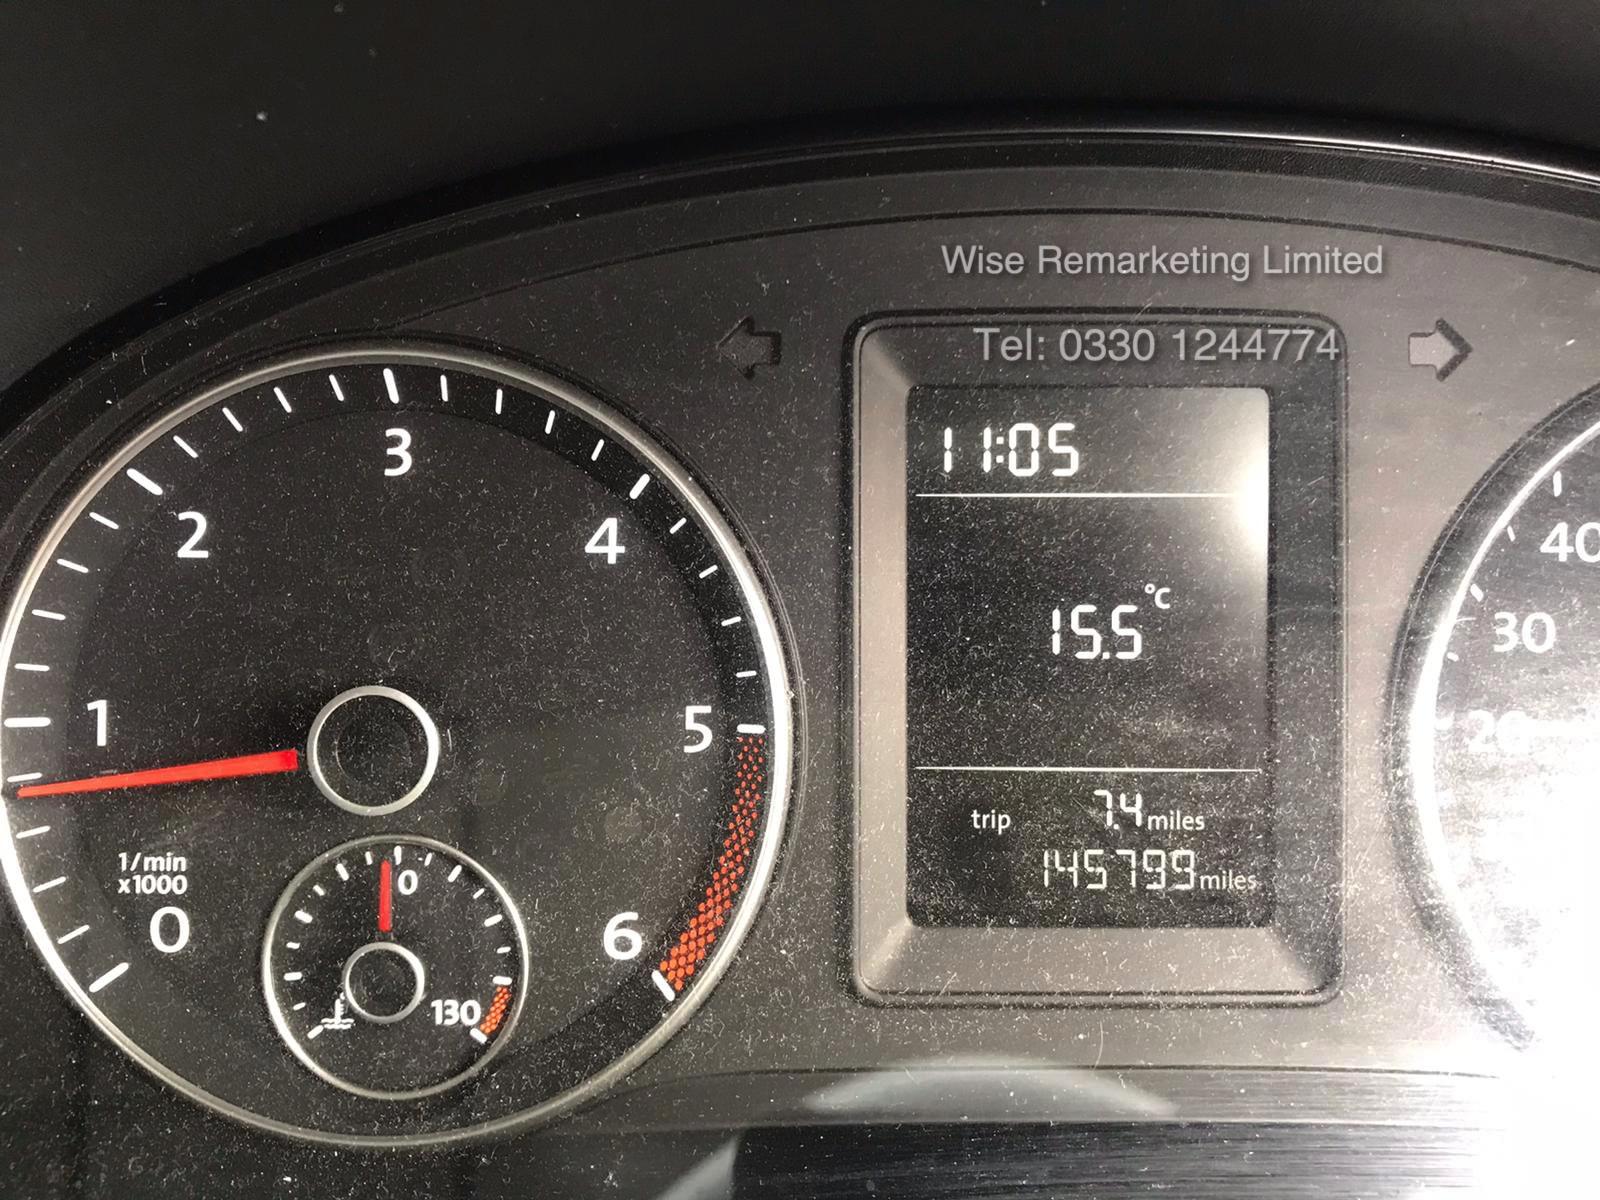 Volkswagen Caddy C20 + Startline 1.6 Tdi - 2014 Model - White - Side Loading Door - Ply Lined - Image 13 of 13